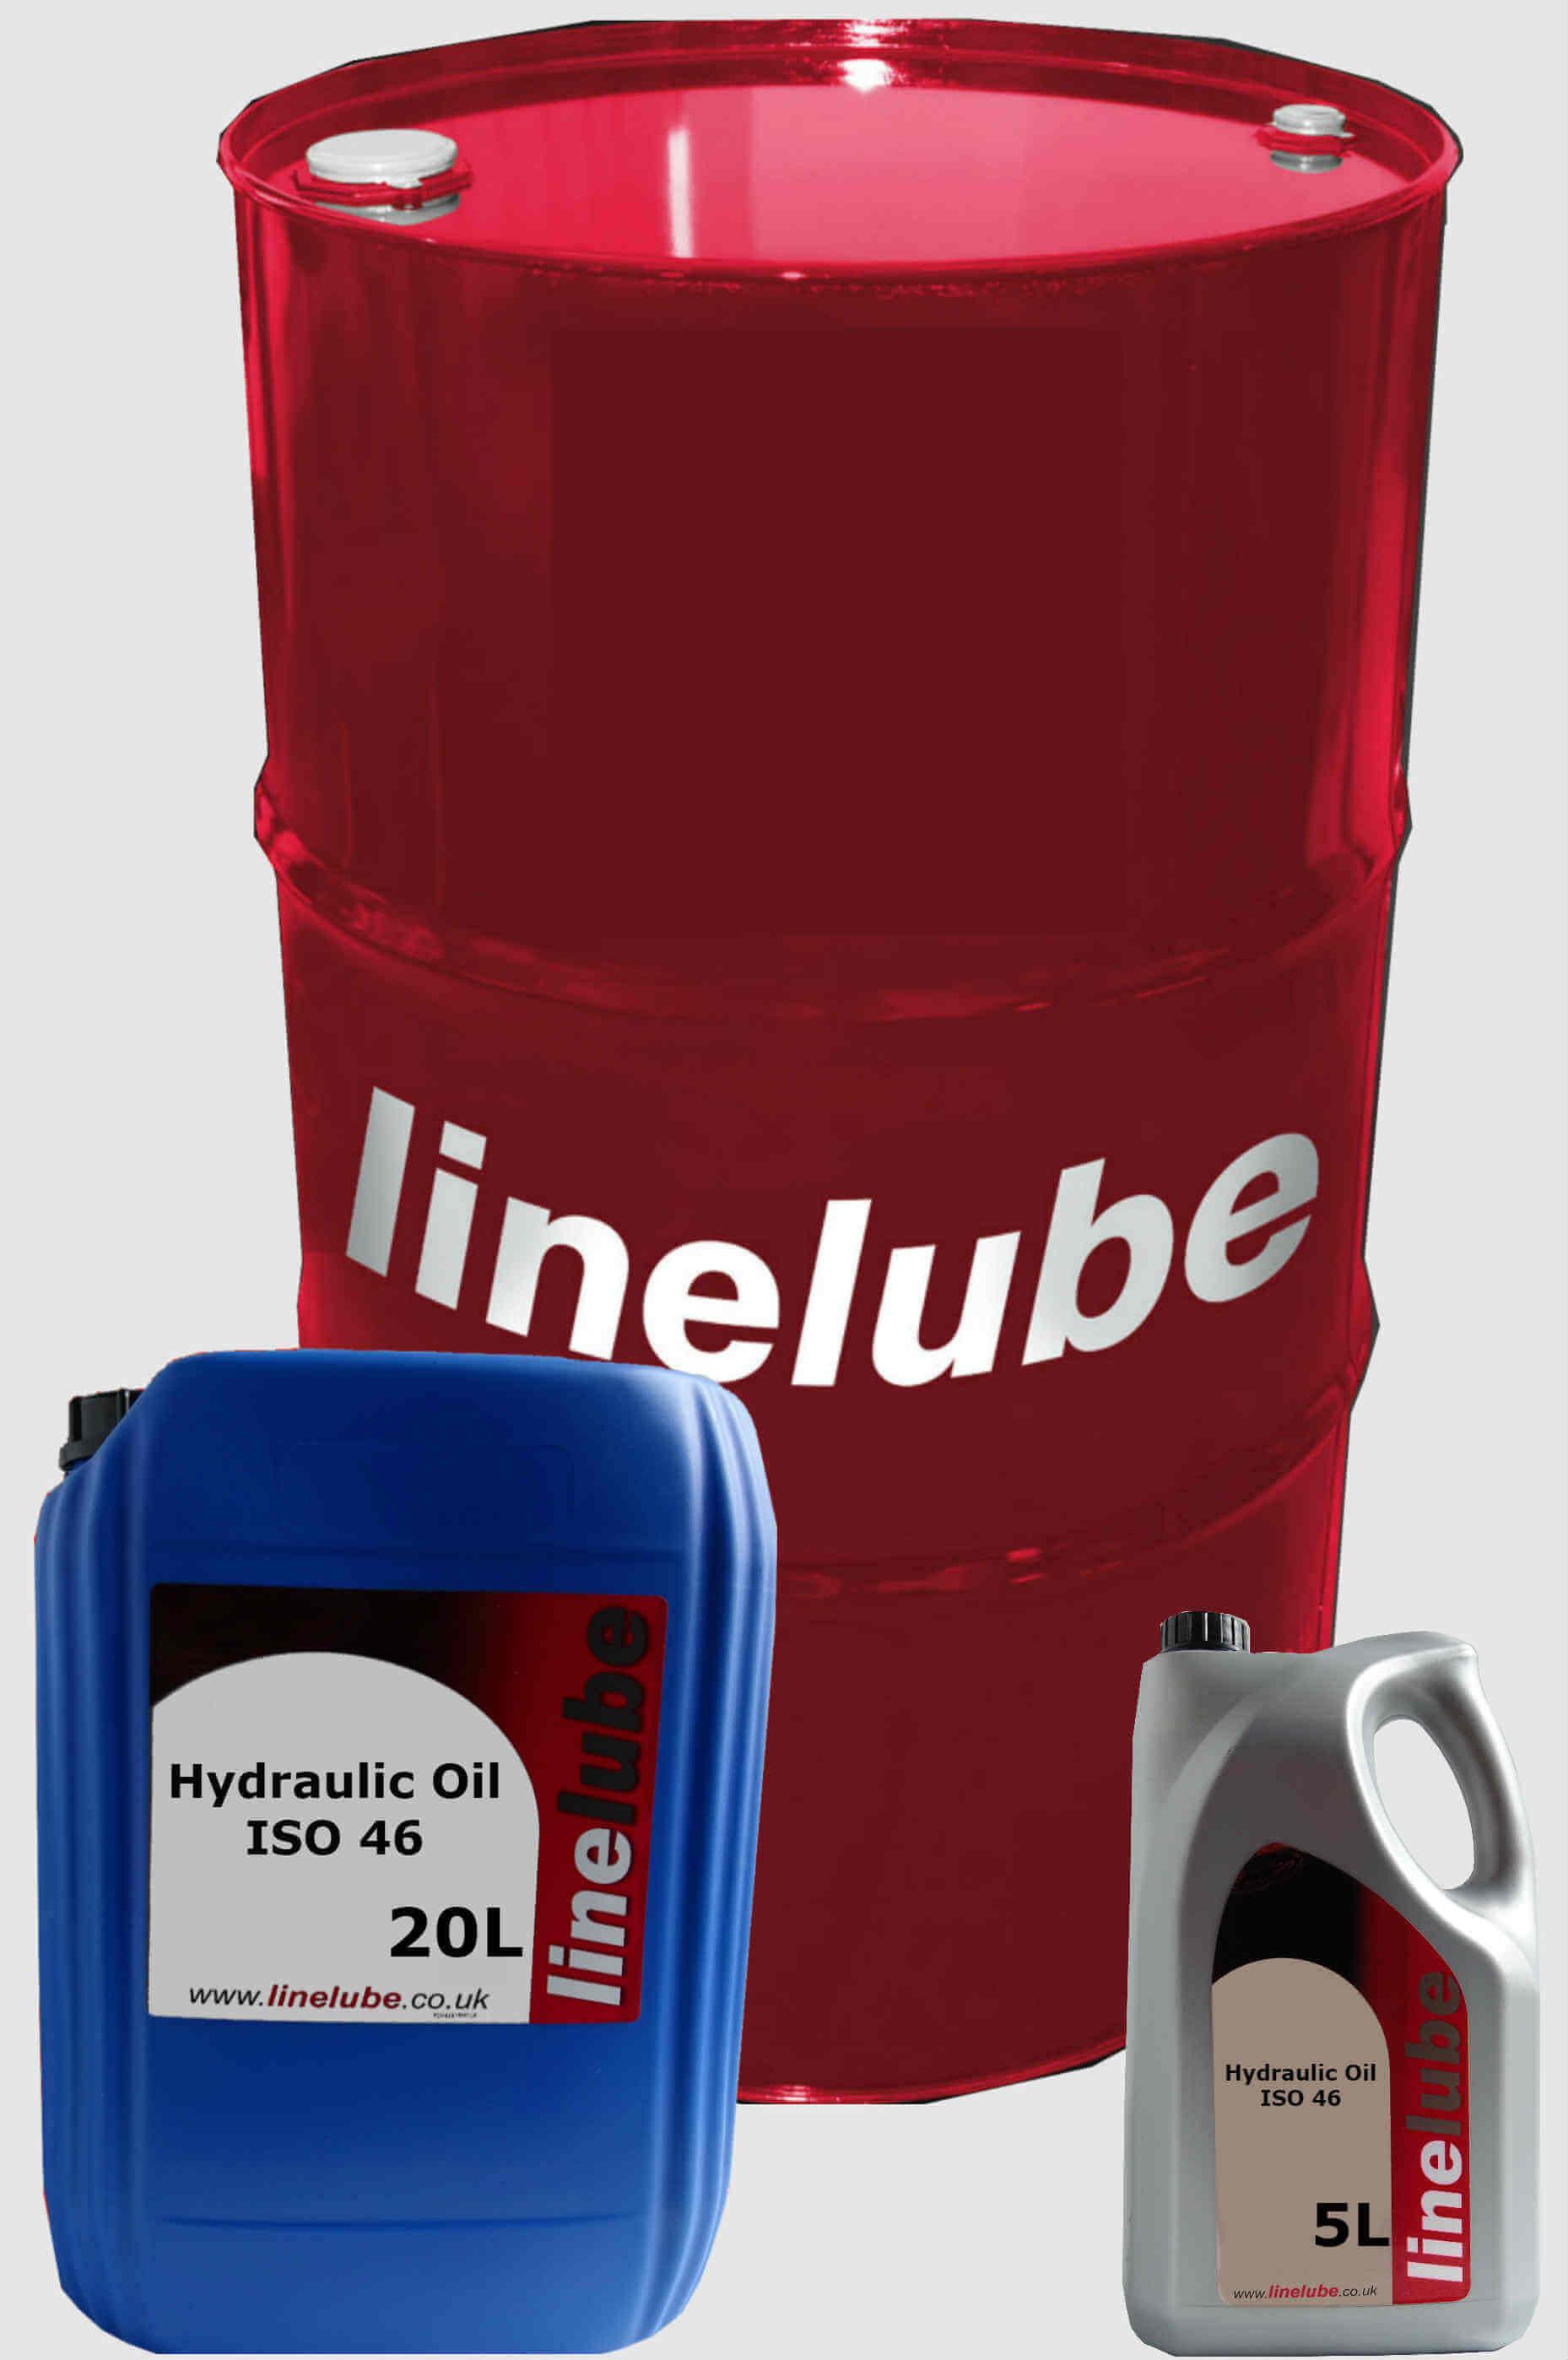 Linelube Hydraulic Oil ISO 46